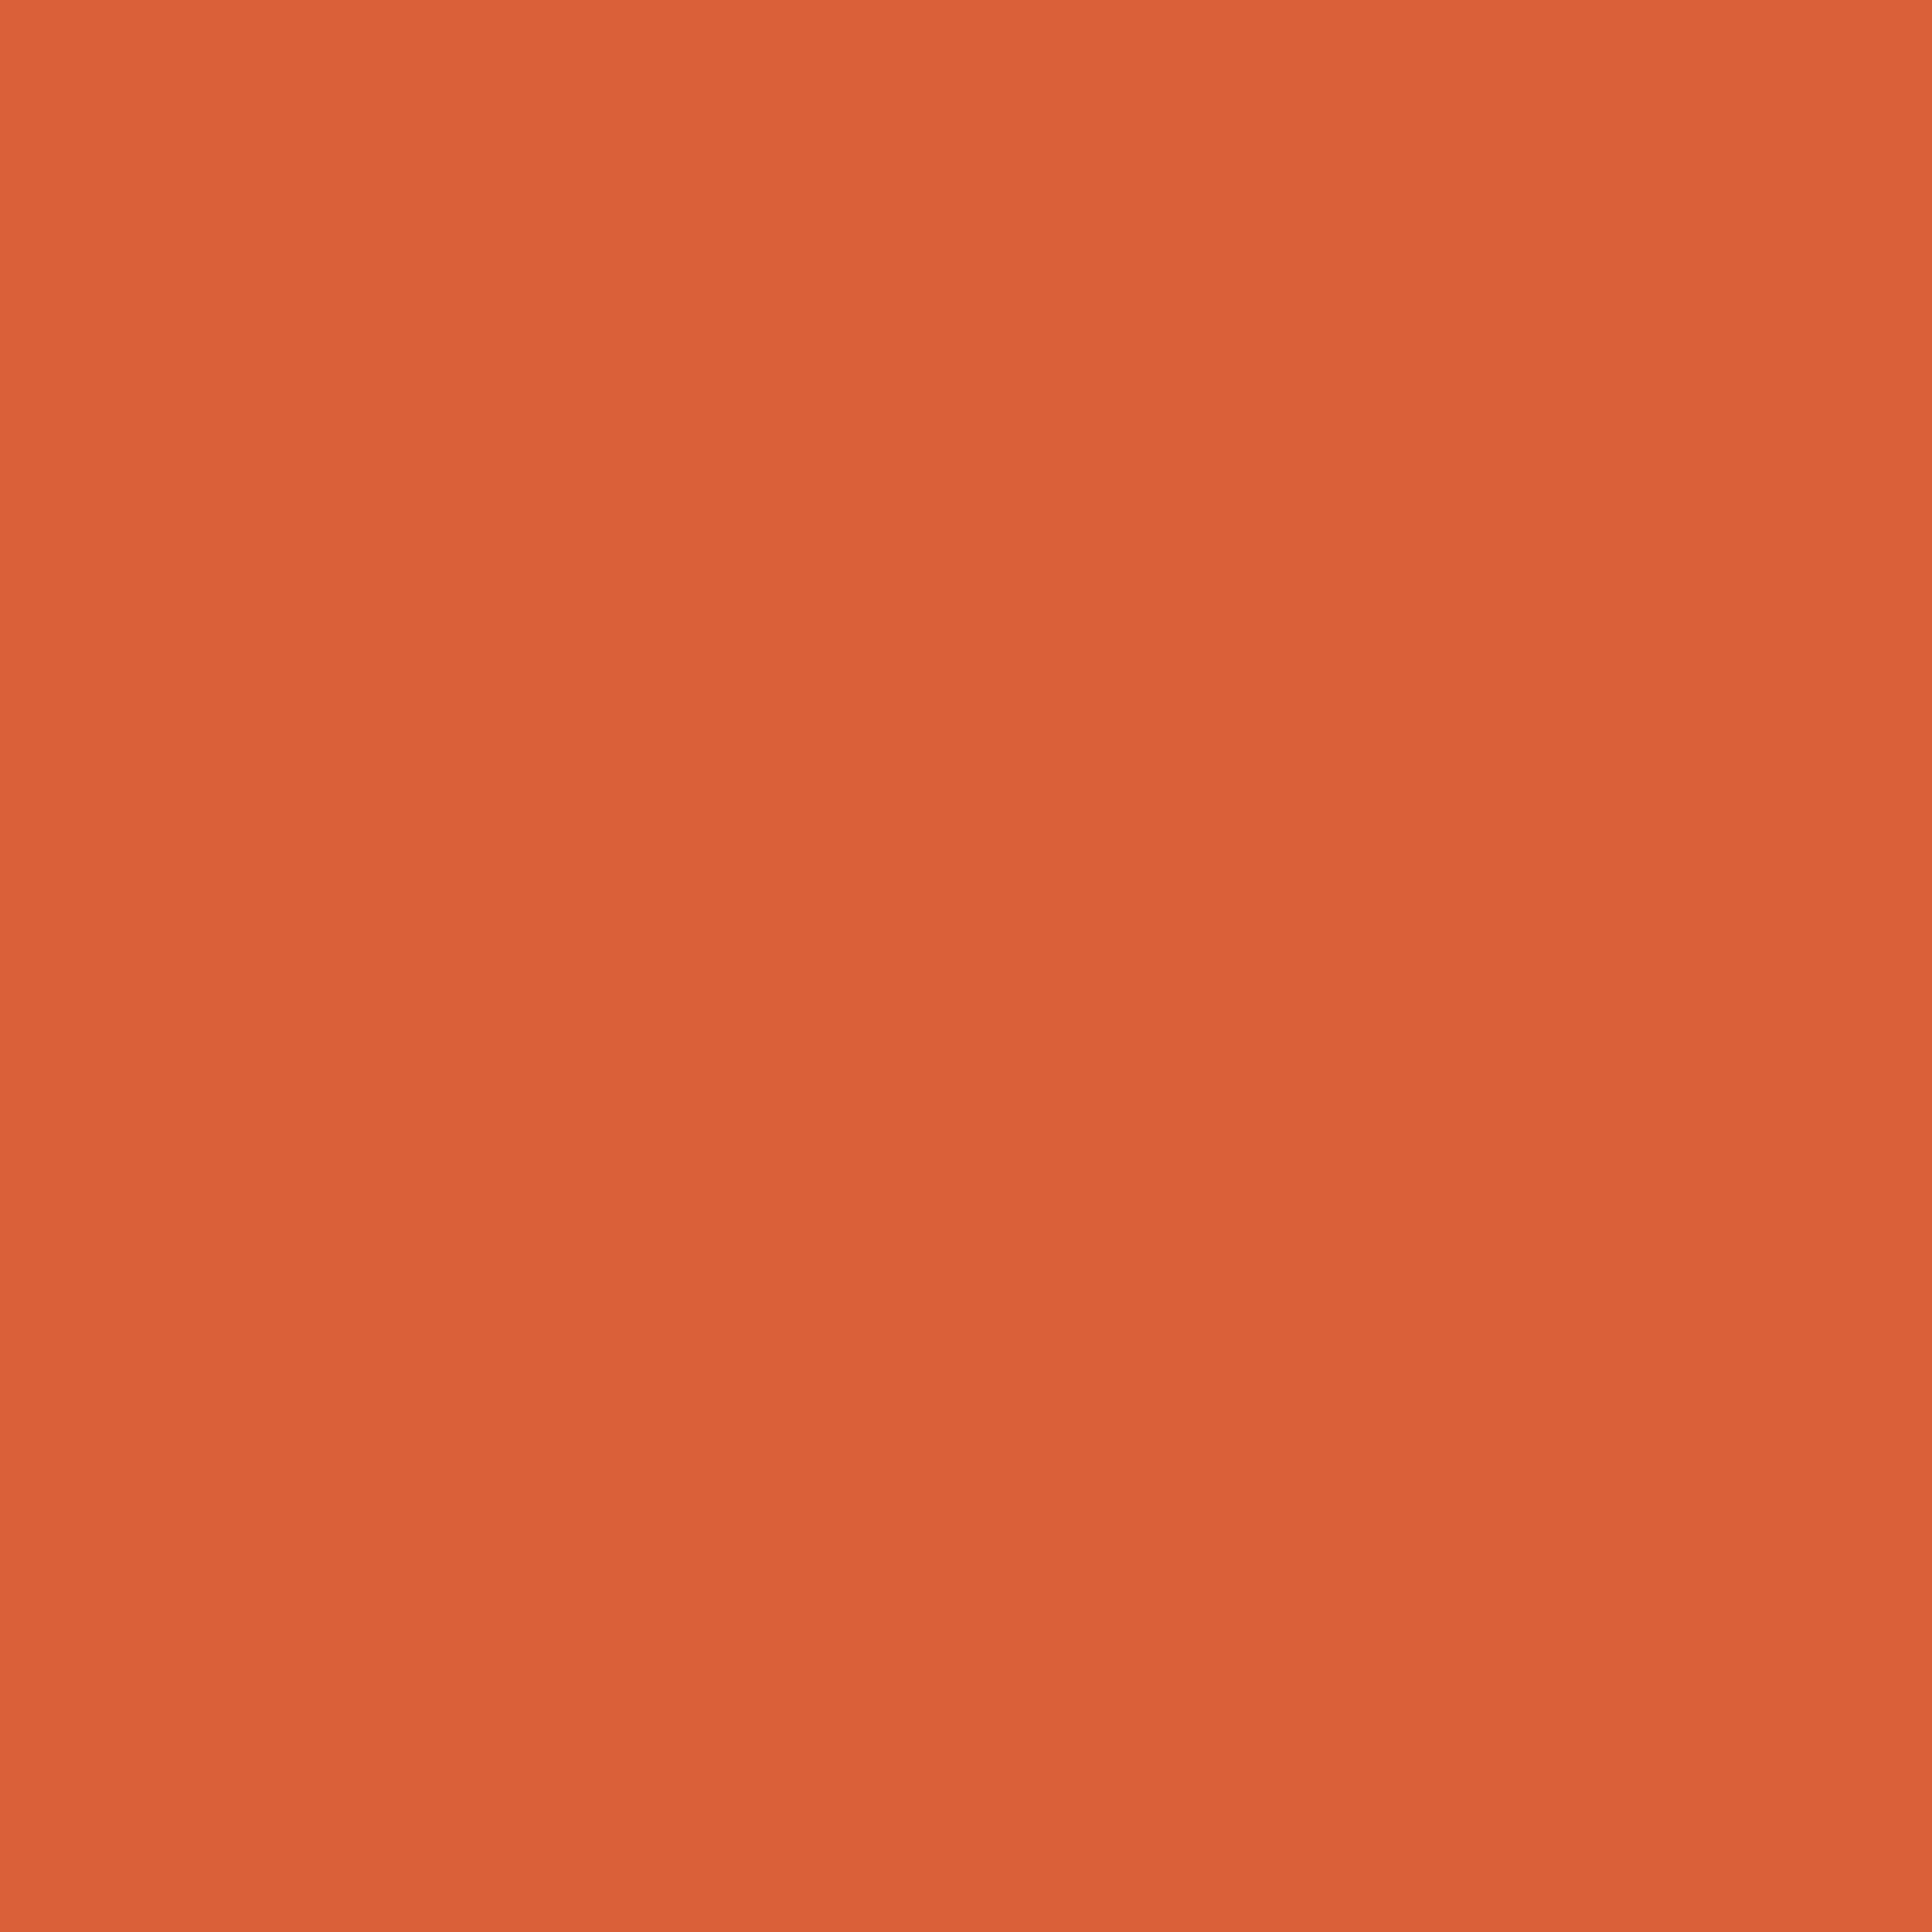 2732x2732 Medium Vermilion Solid Color Background